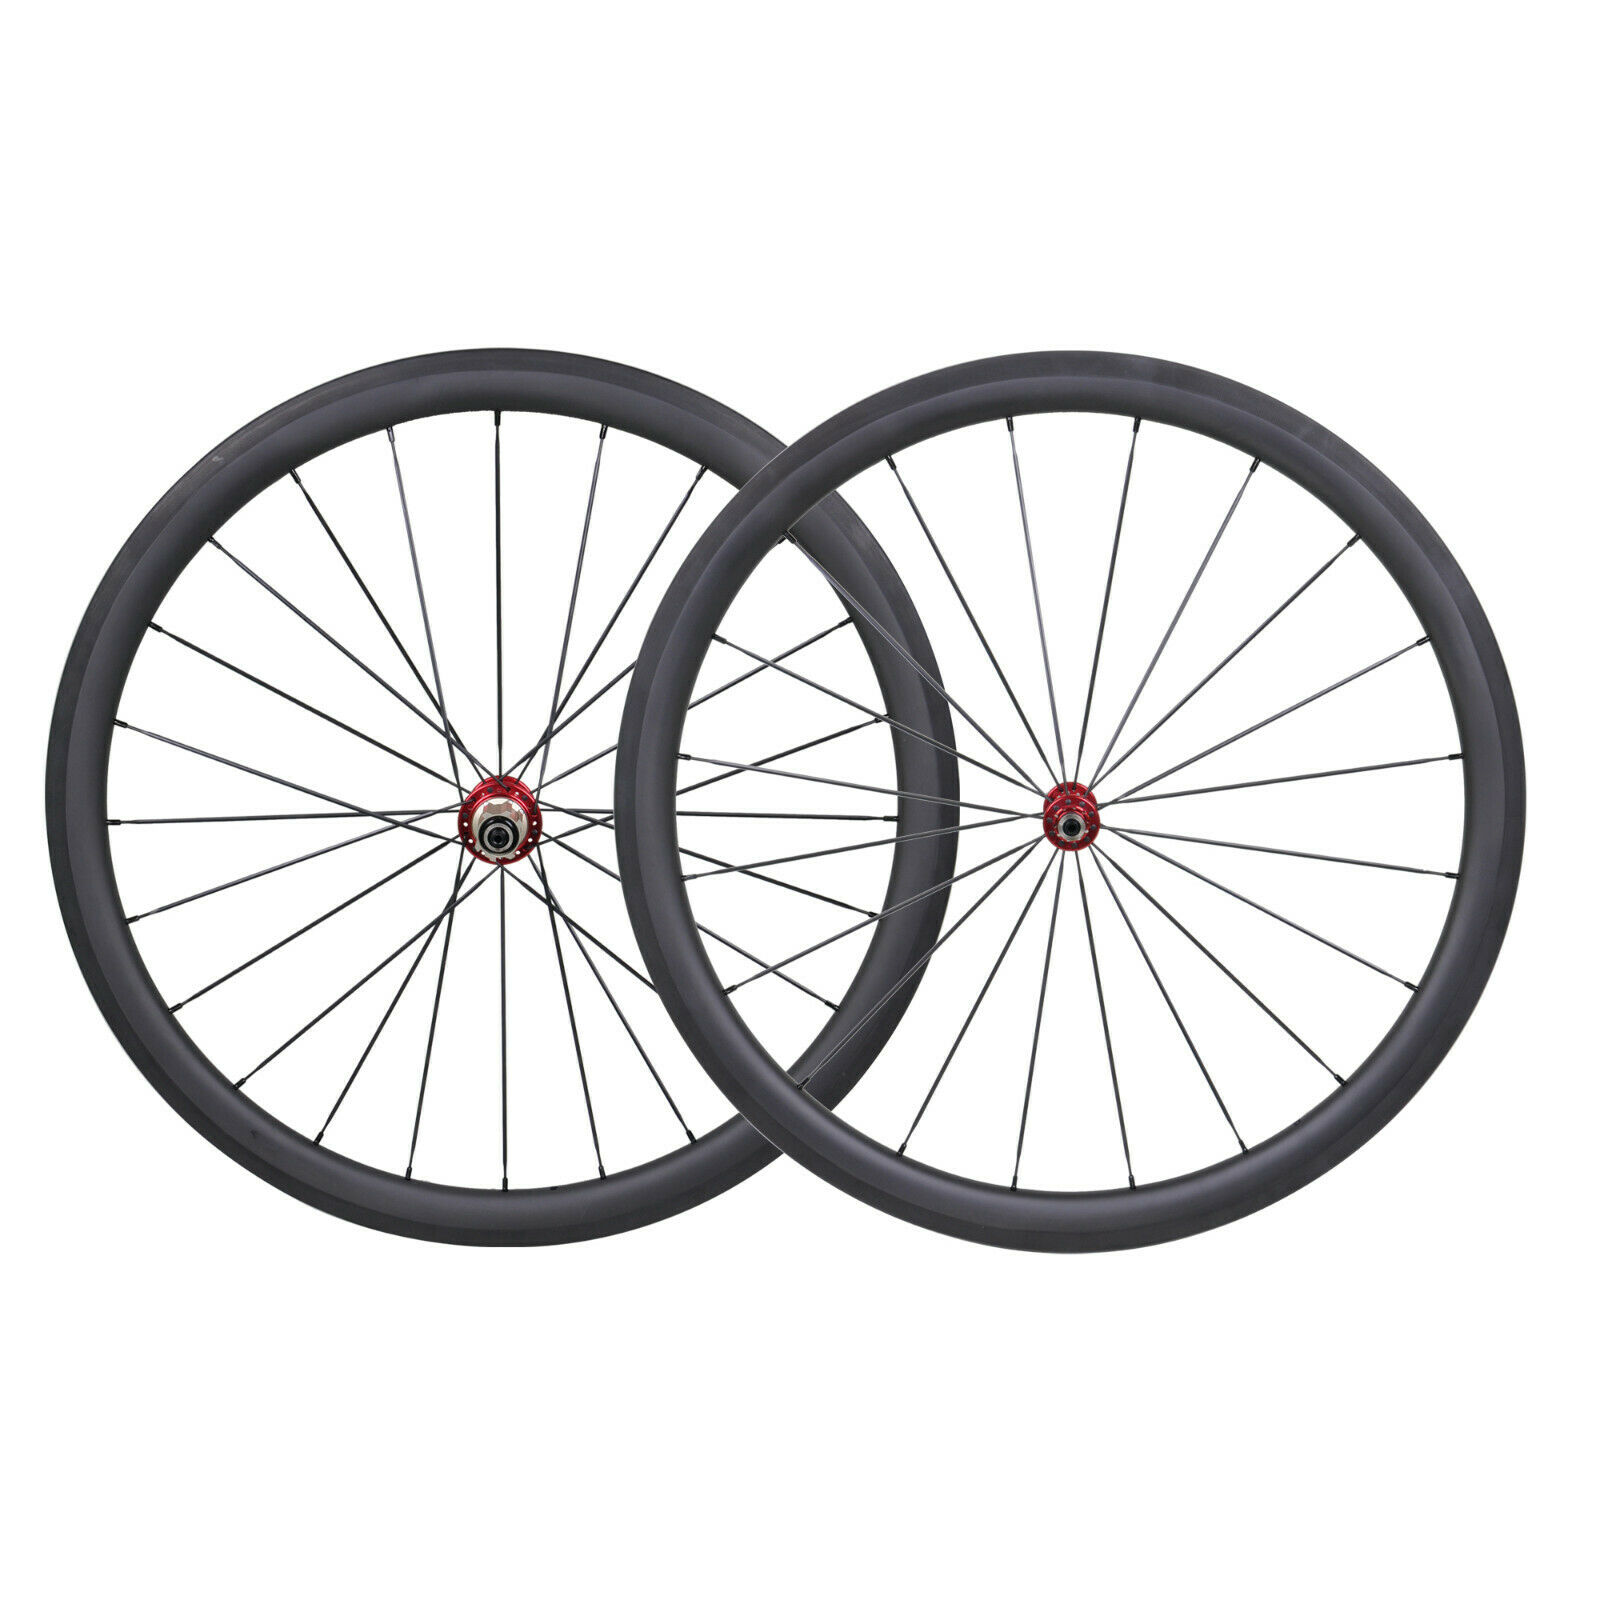 Kolhjul Tubular 38mm Road Bicycle UD Matt Rim broms 70C basalt Novatec